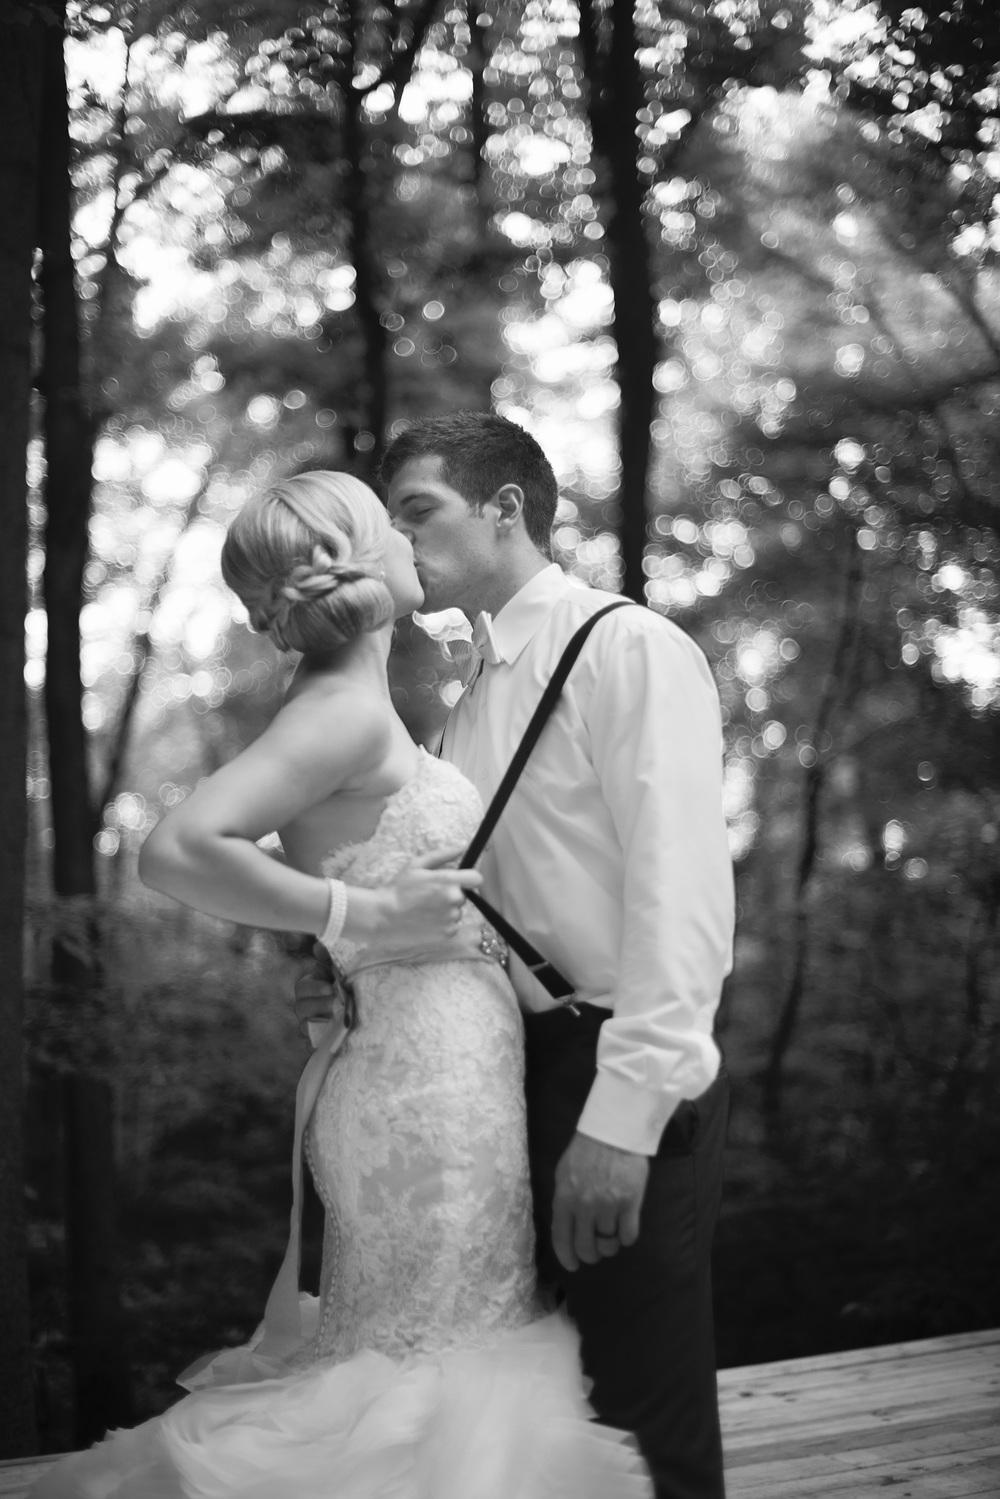 bride groom kiss portrait THPHOTO forest background bw